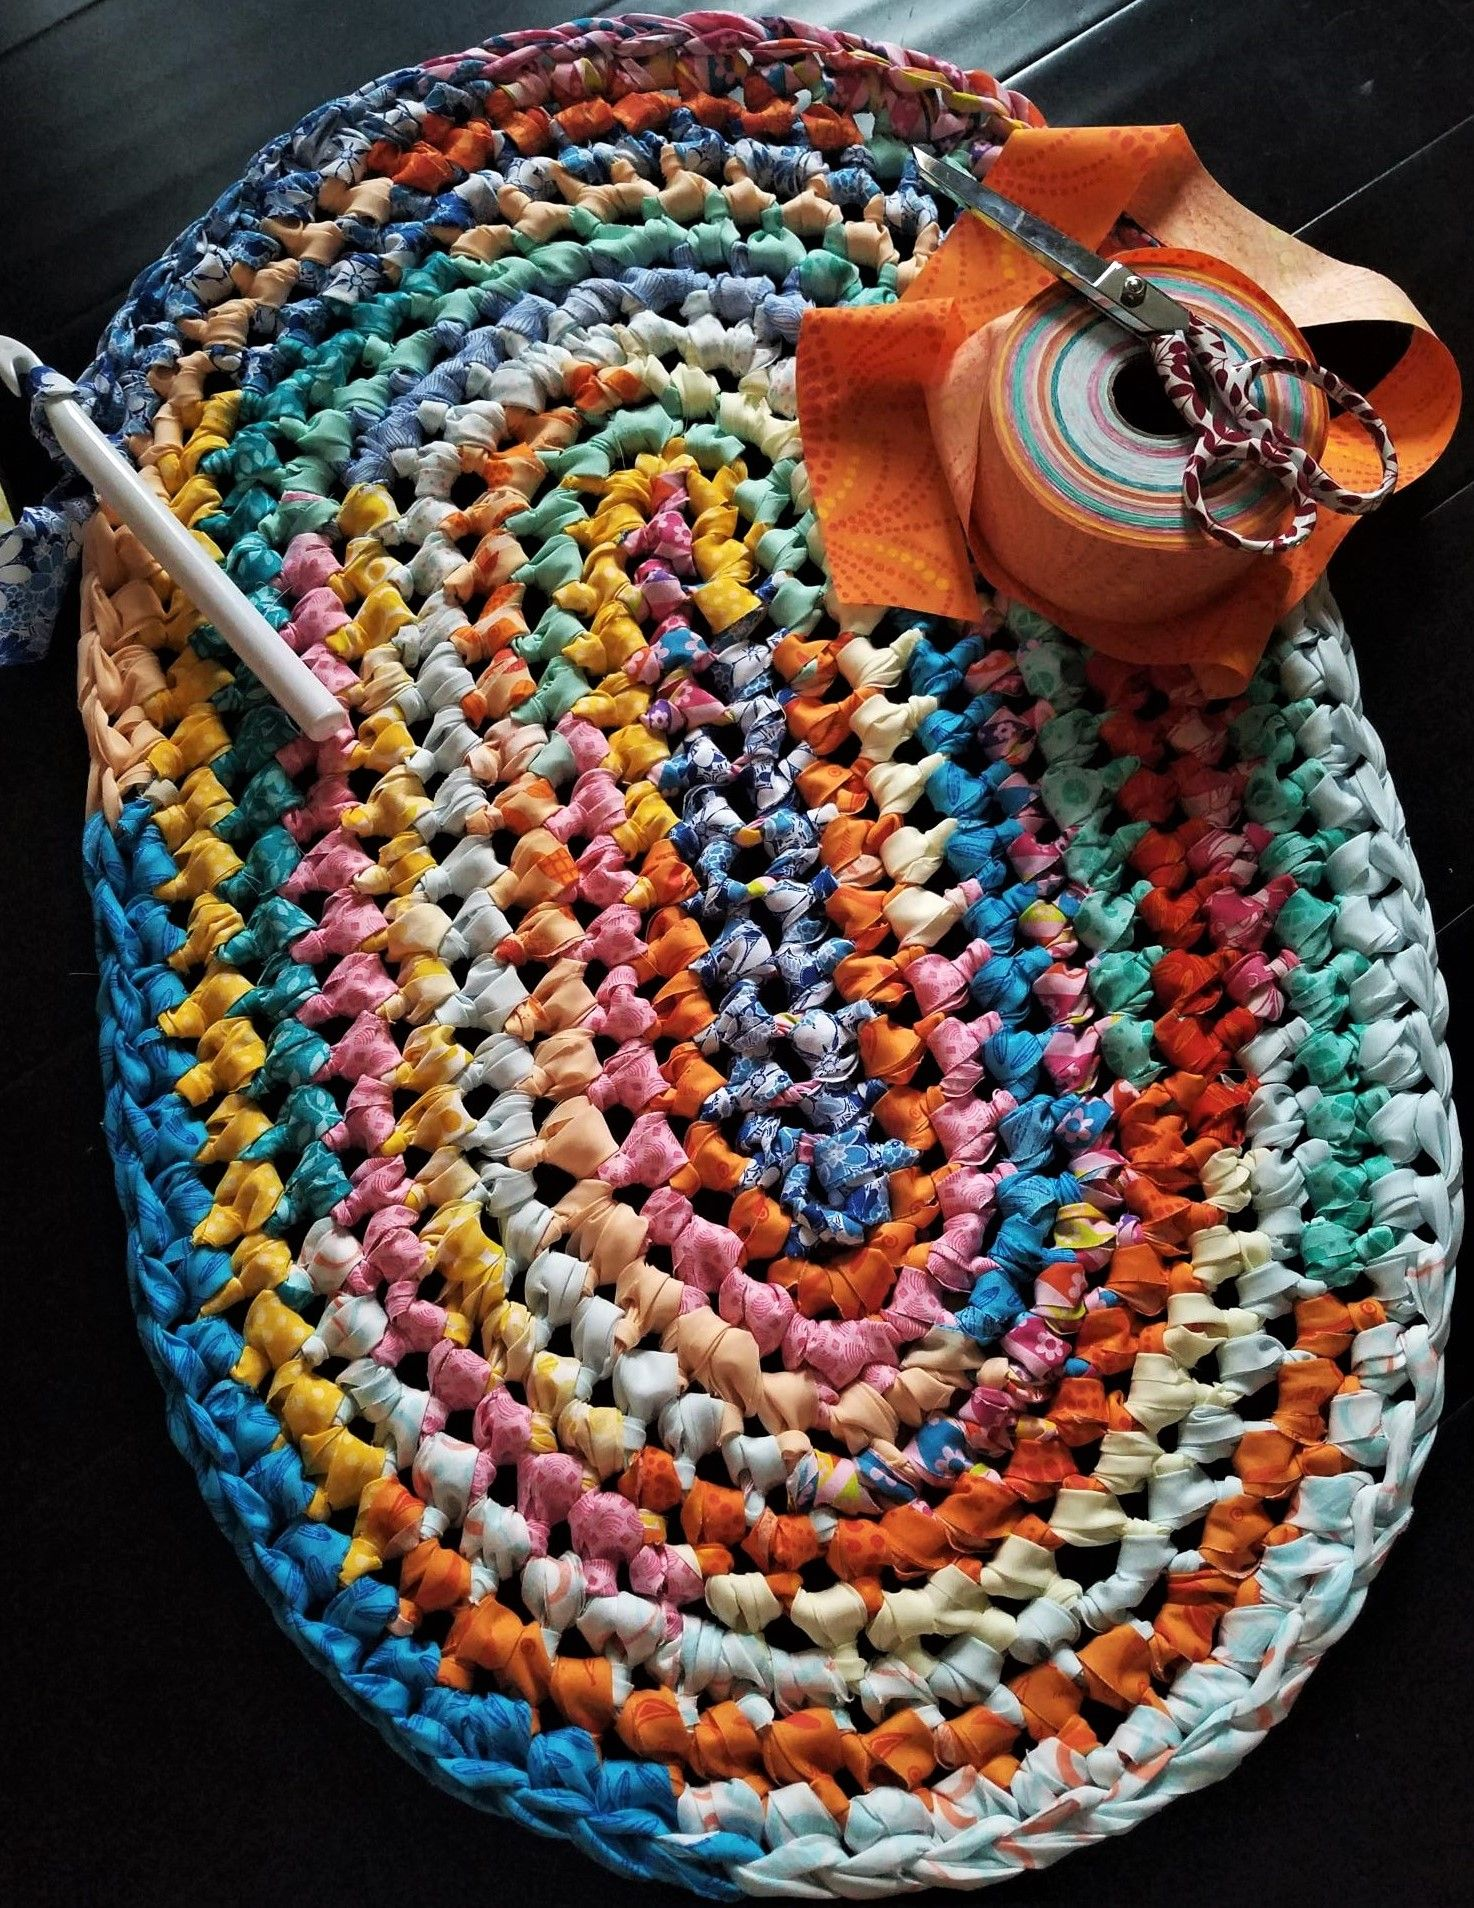 Rag Rug Fabric Bundles Fabric Strips Rags To Rugs By Lora Rag Rug Diy Braided Rug Diy Crochet Rag Rug